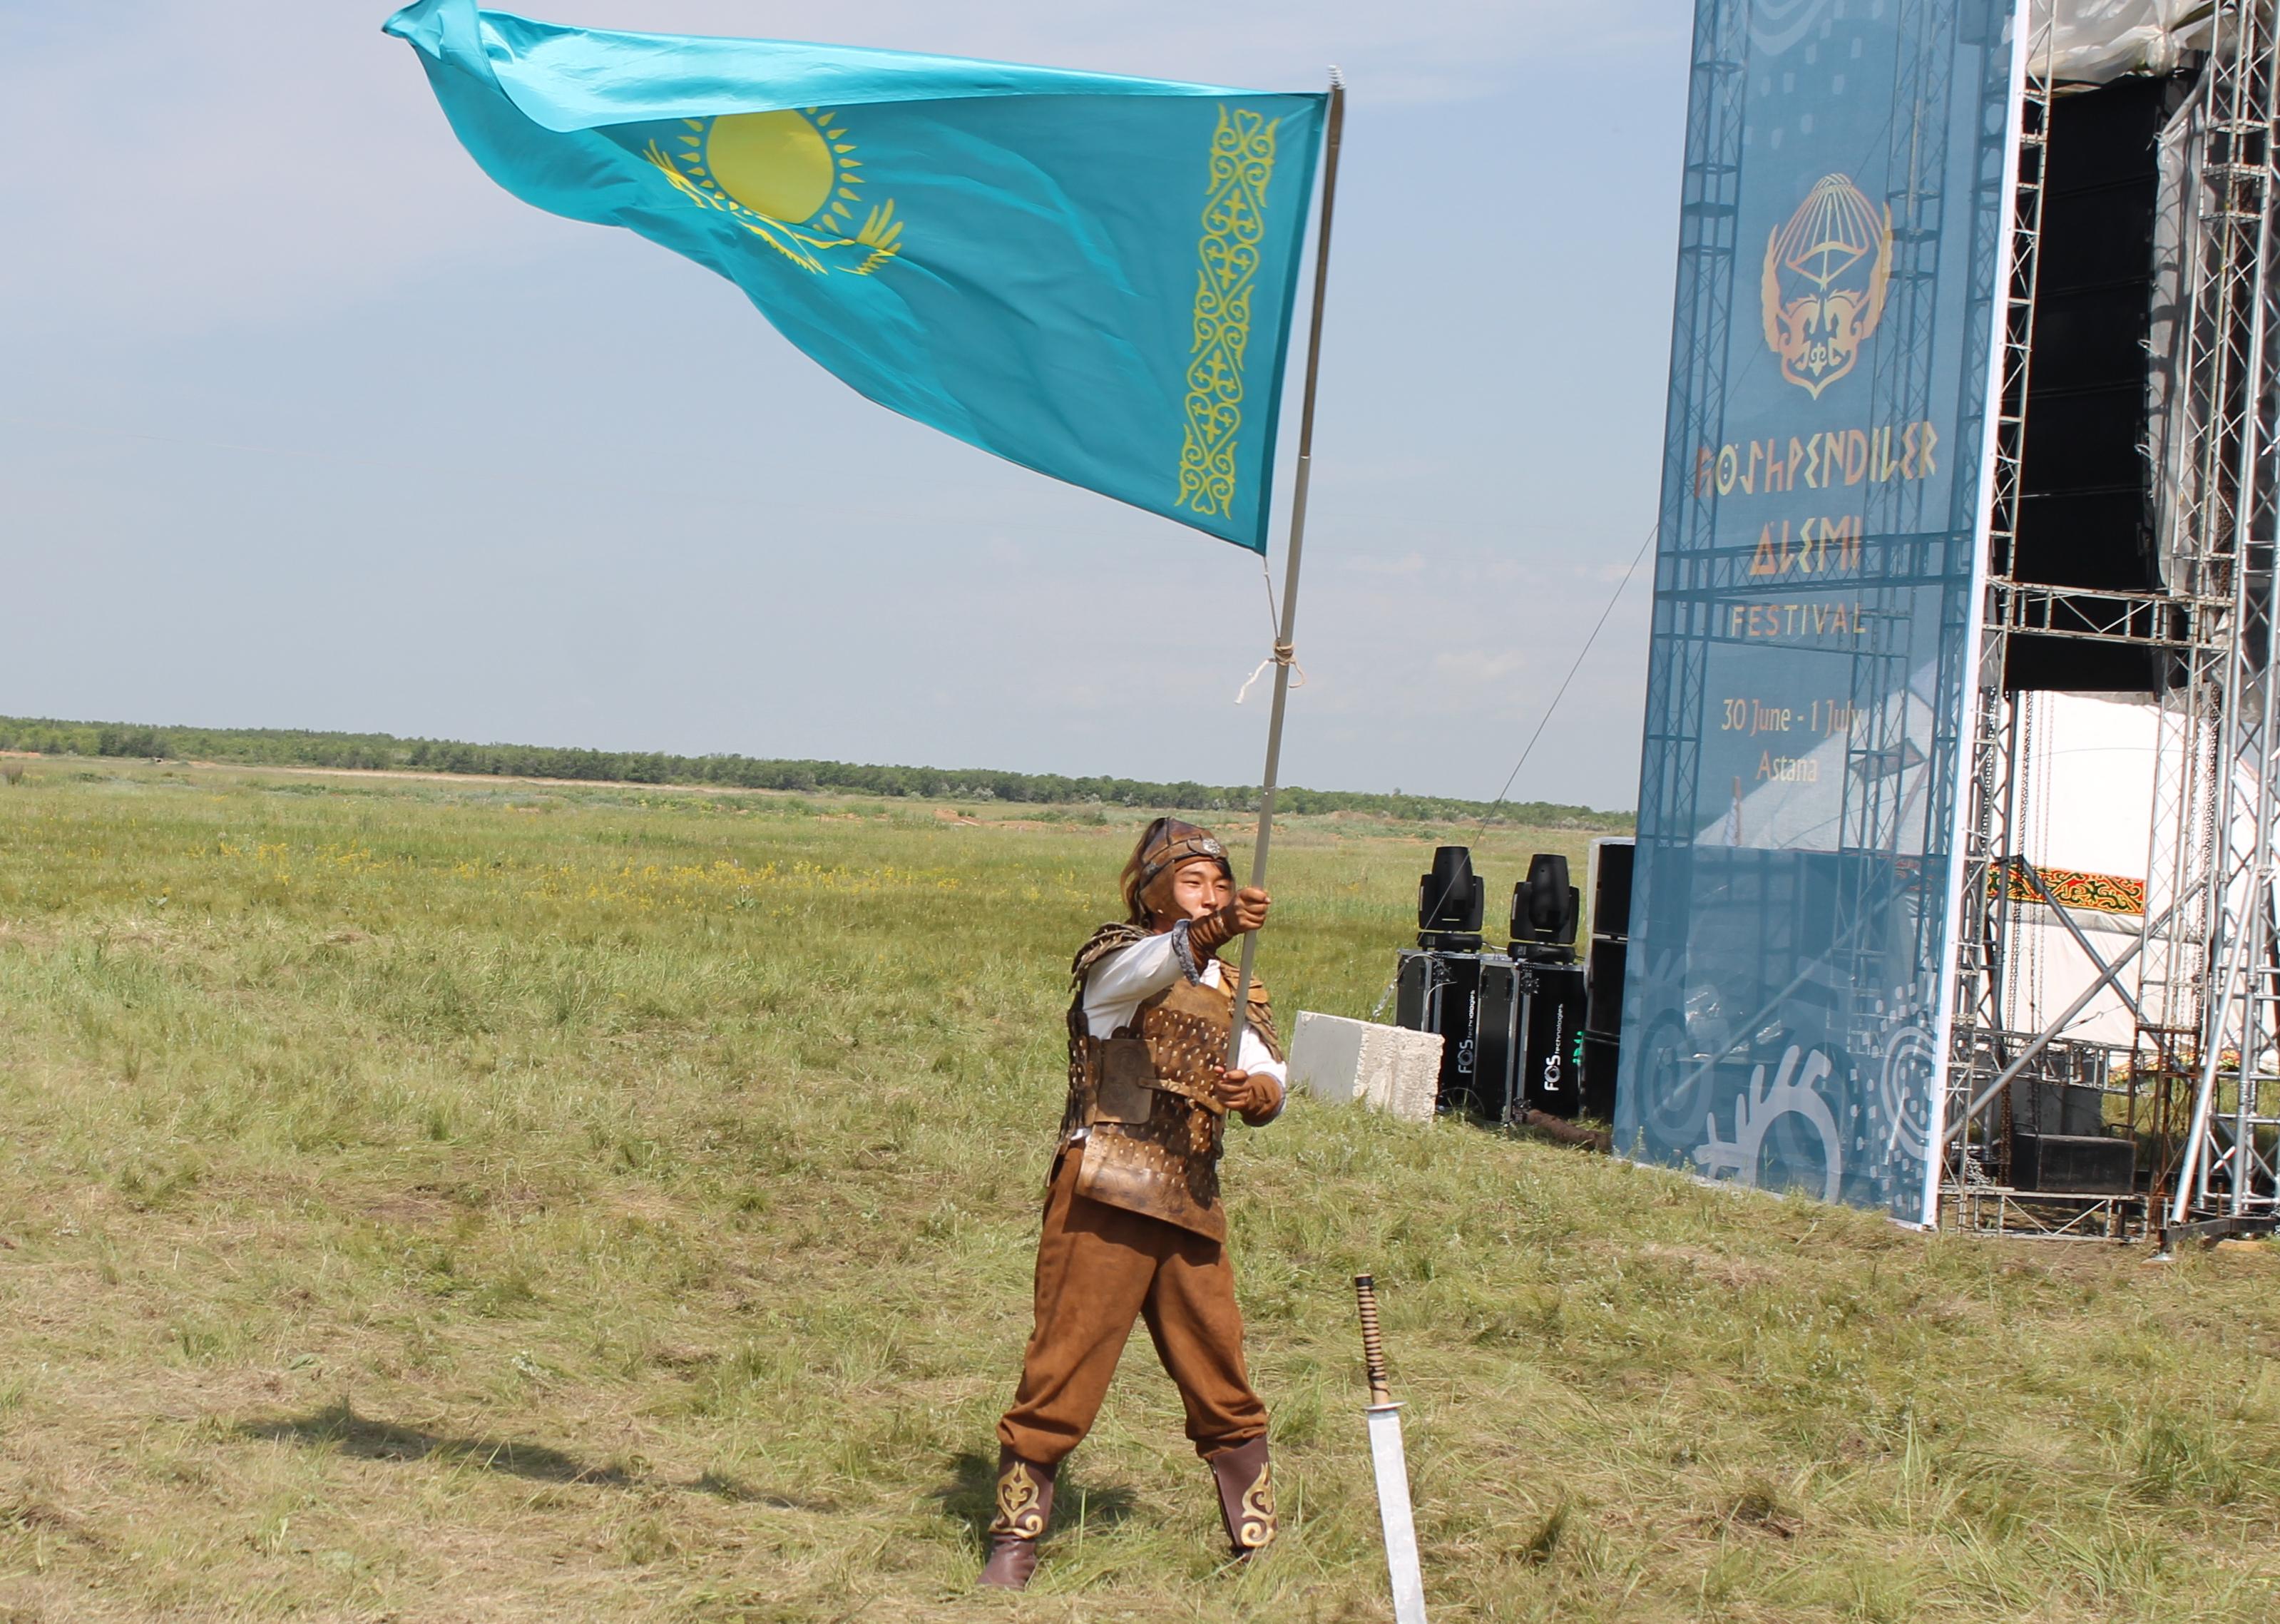 In photos: Astana hosts international nomadic festival